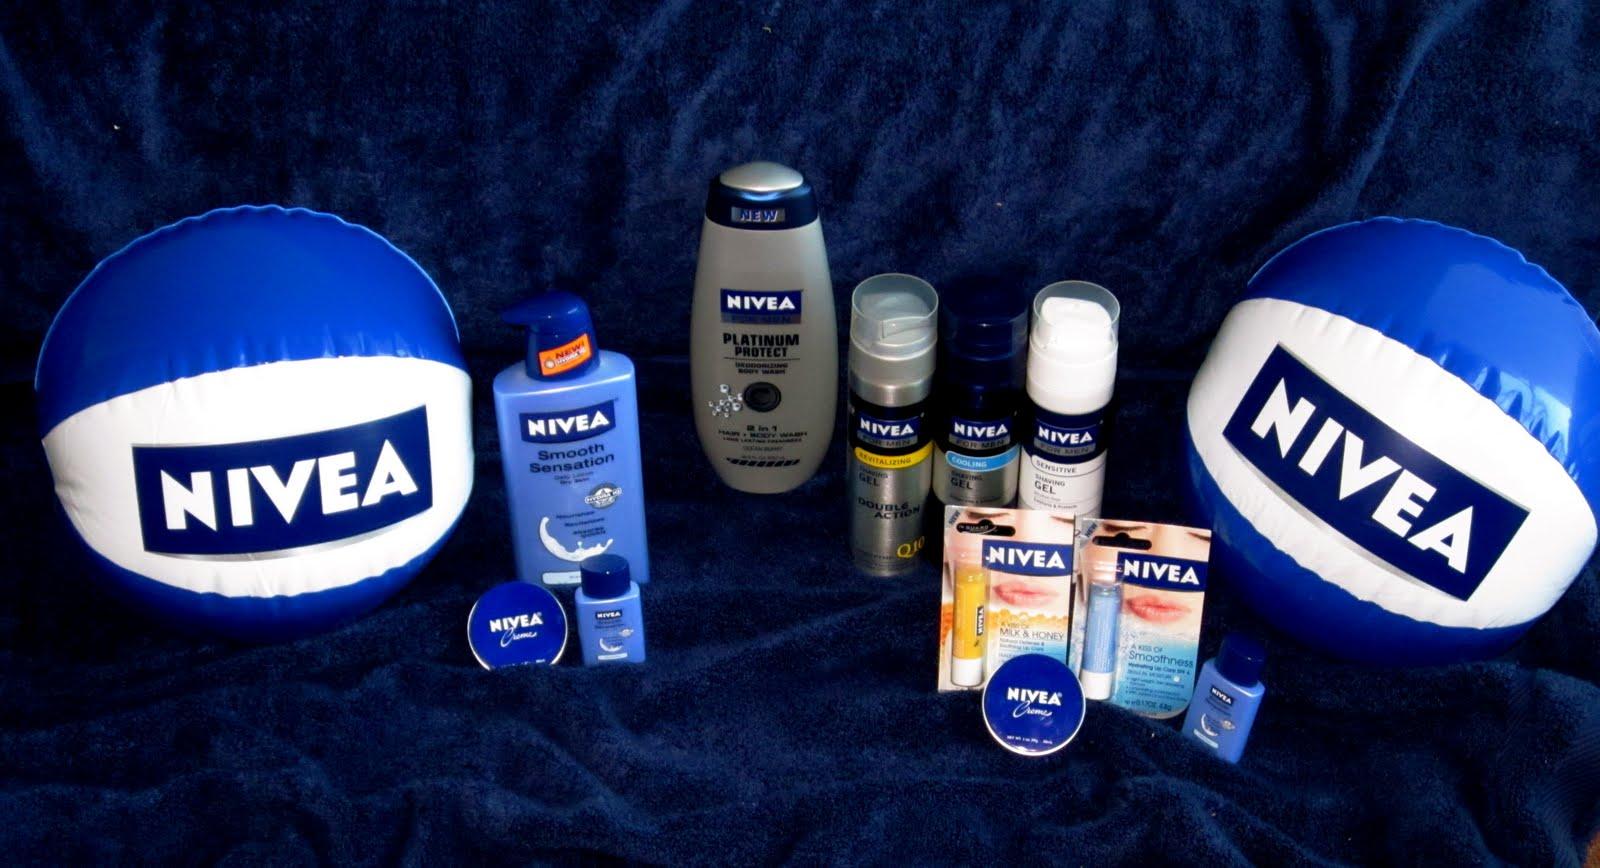 Nivea Giveaway & Sammiu0027s Blog of Life: Nivea Giveaway